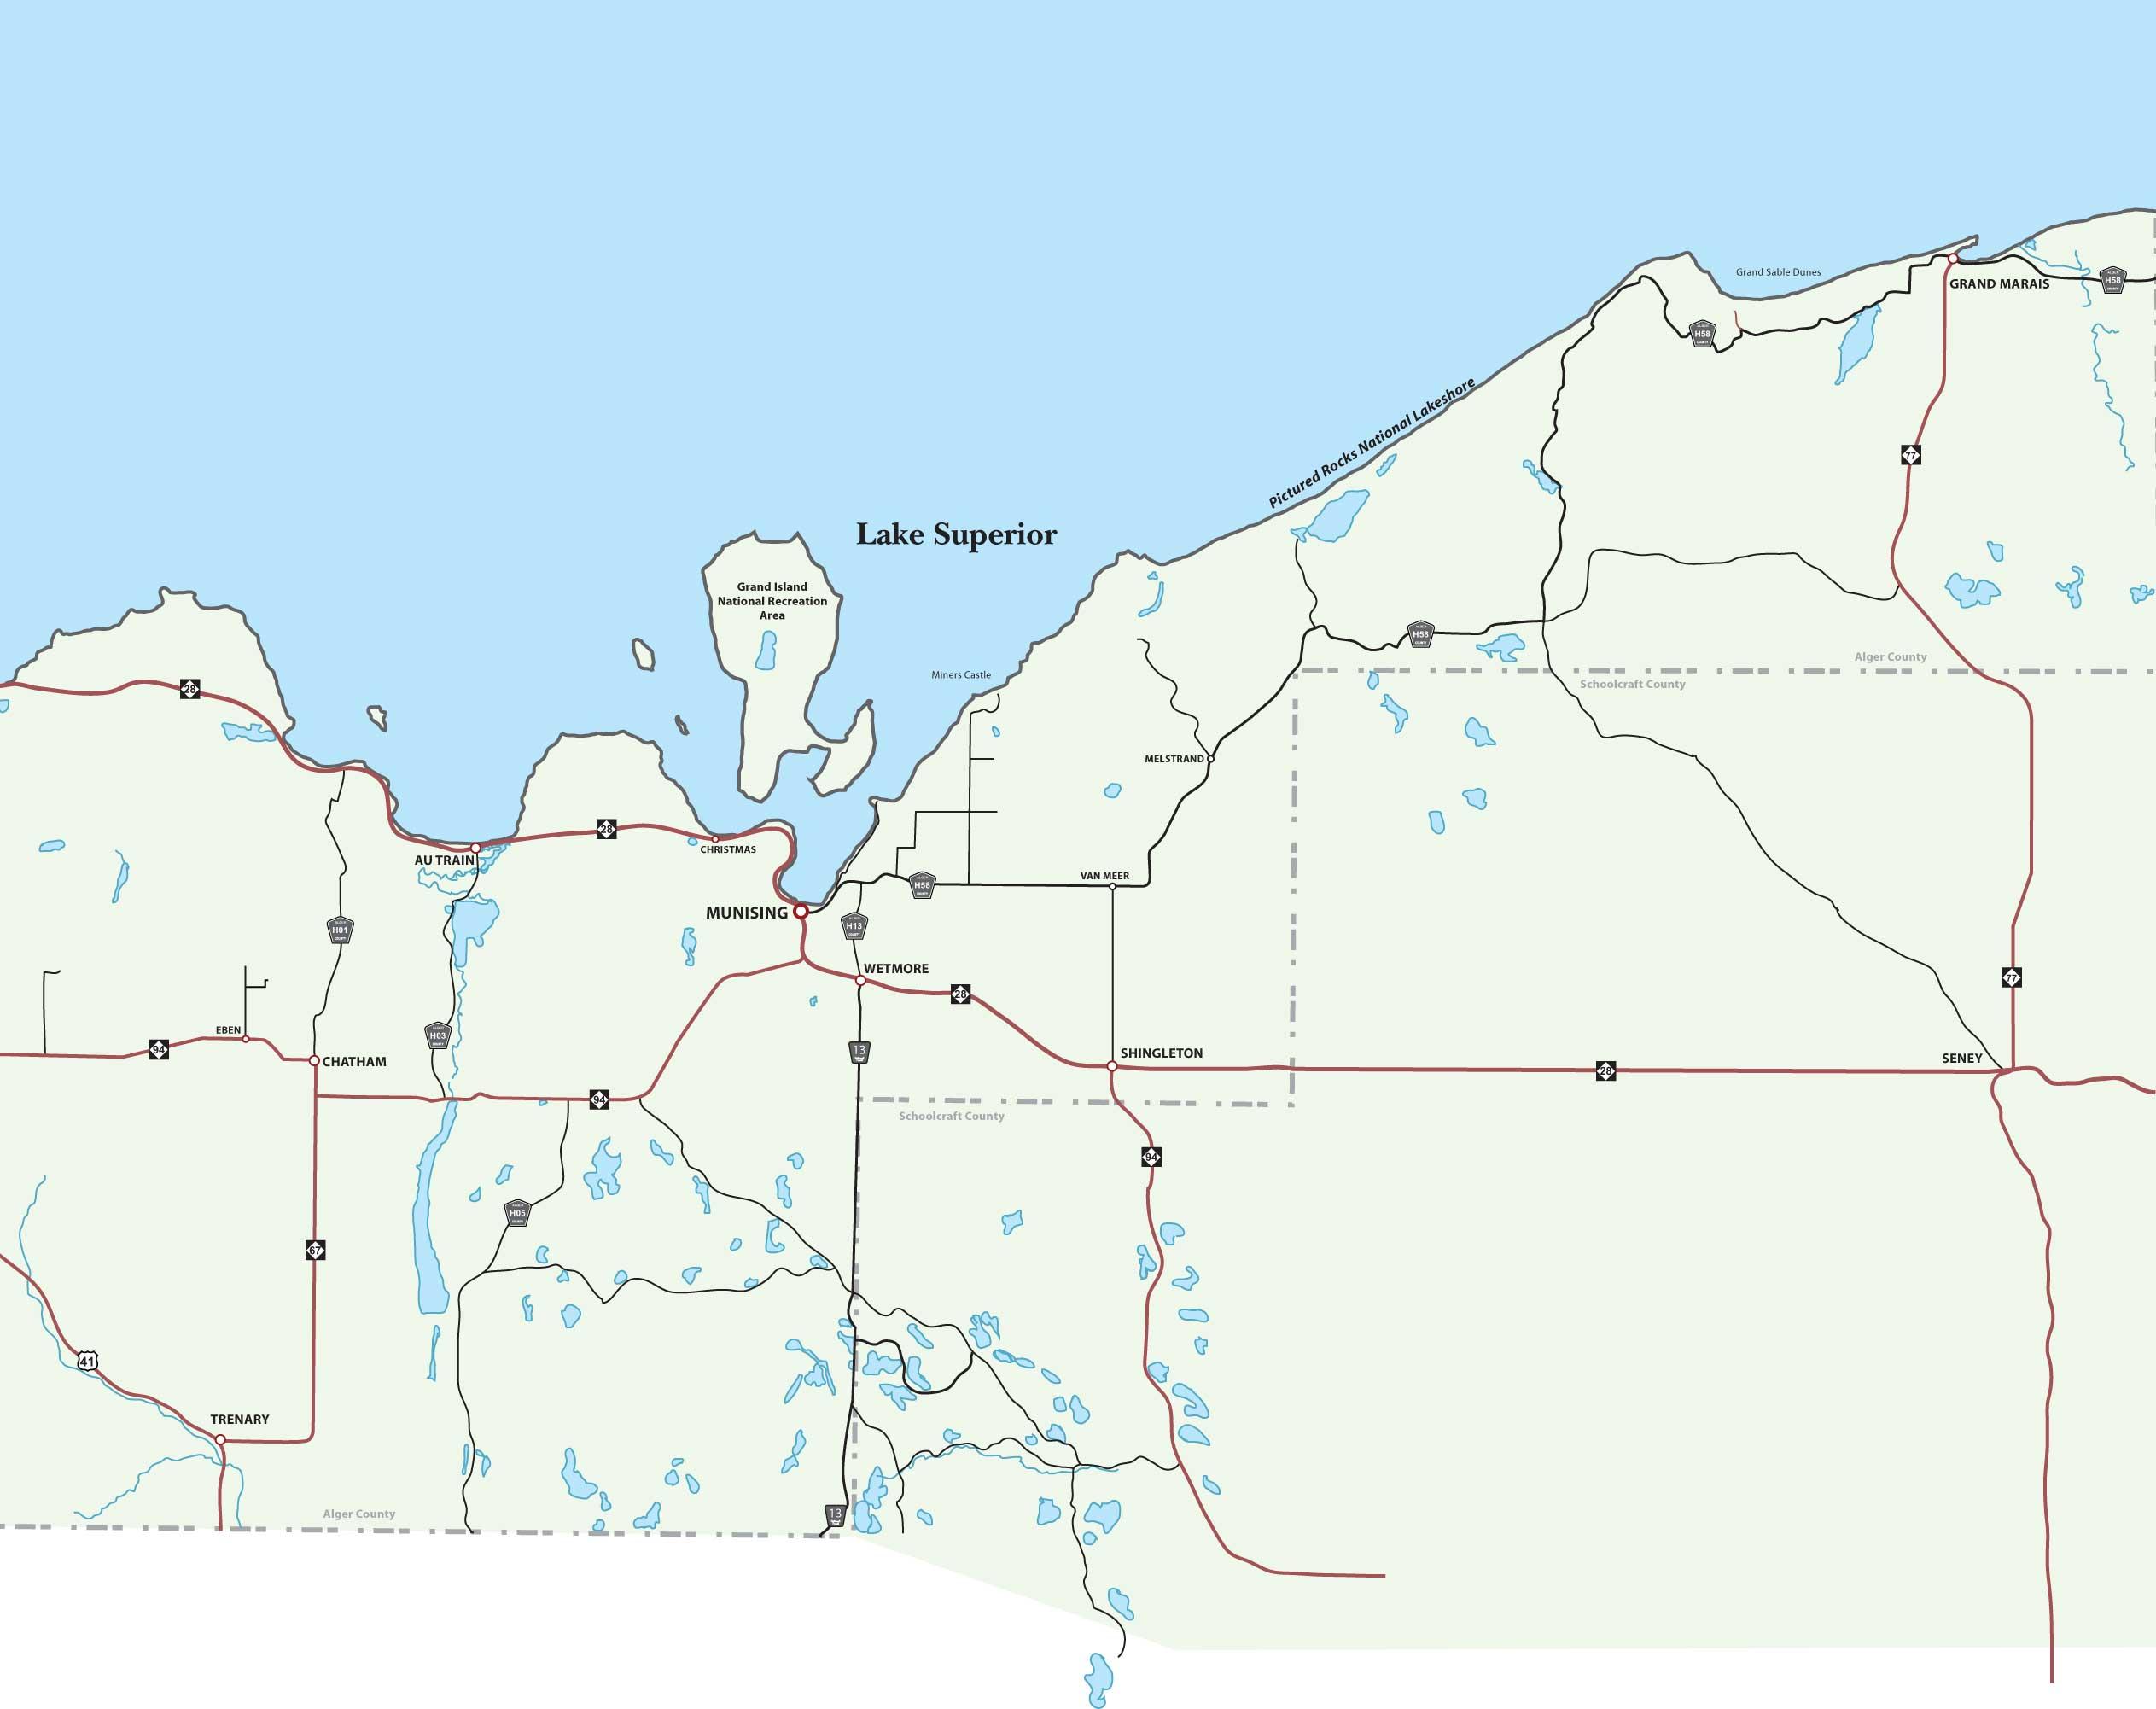 Michigan alger county munising - More